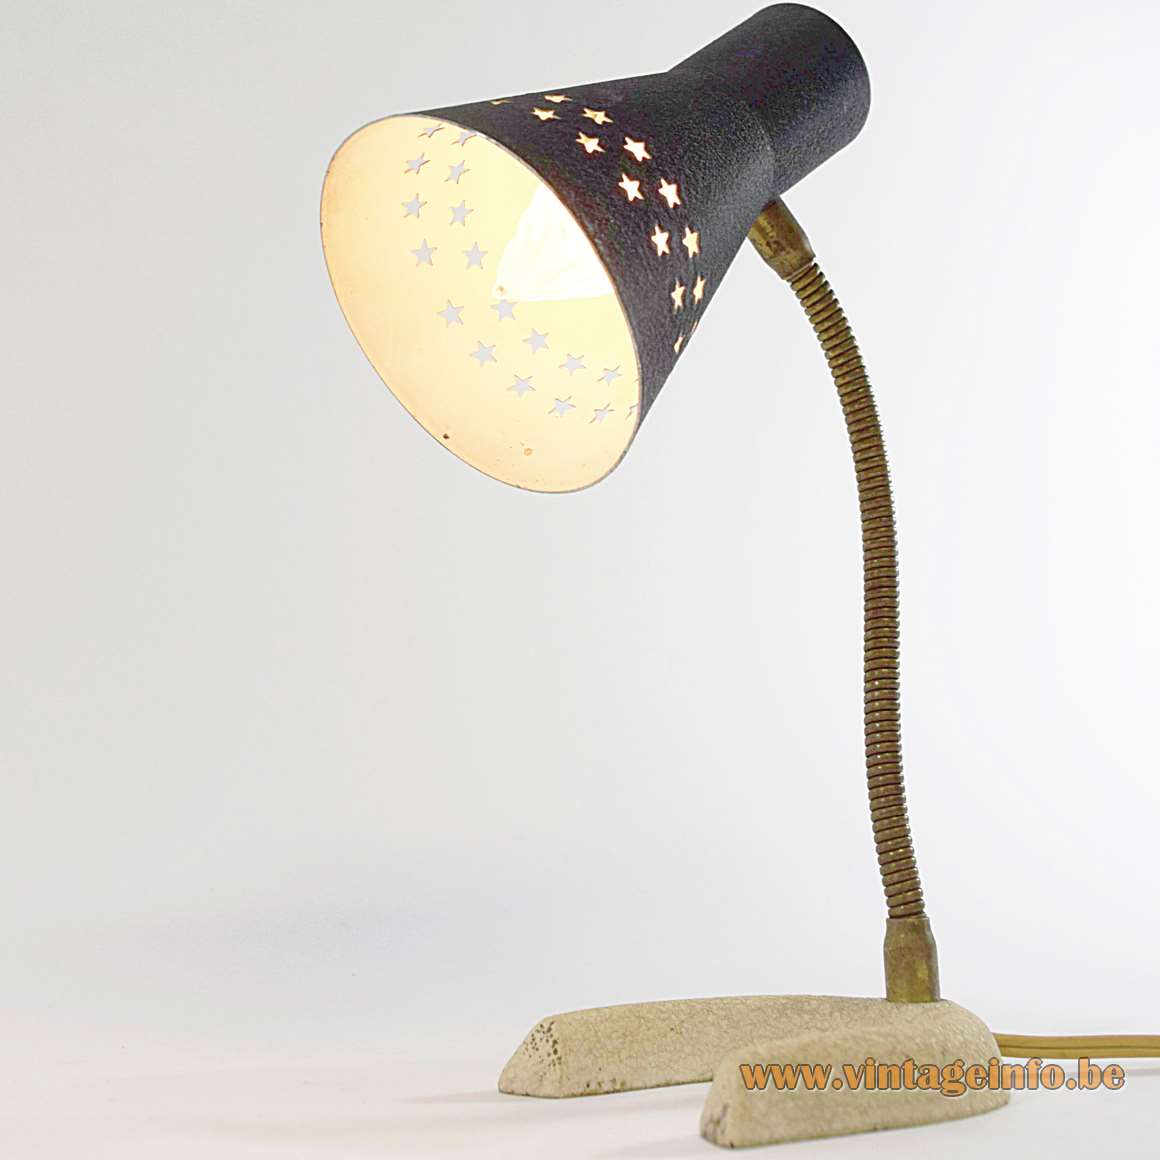 Horseshoe desk lamp table lamp perforated stars lampshade brass gooseneck 1950s 1960s cast iron base wrinklepaint MCM Mid-Century Modern